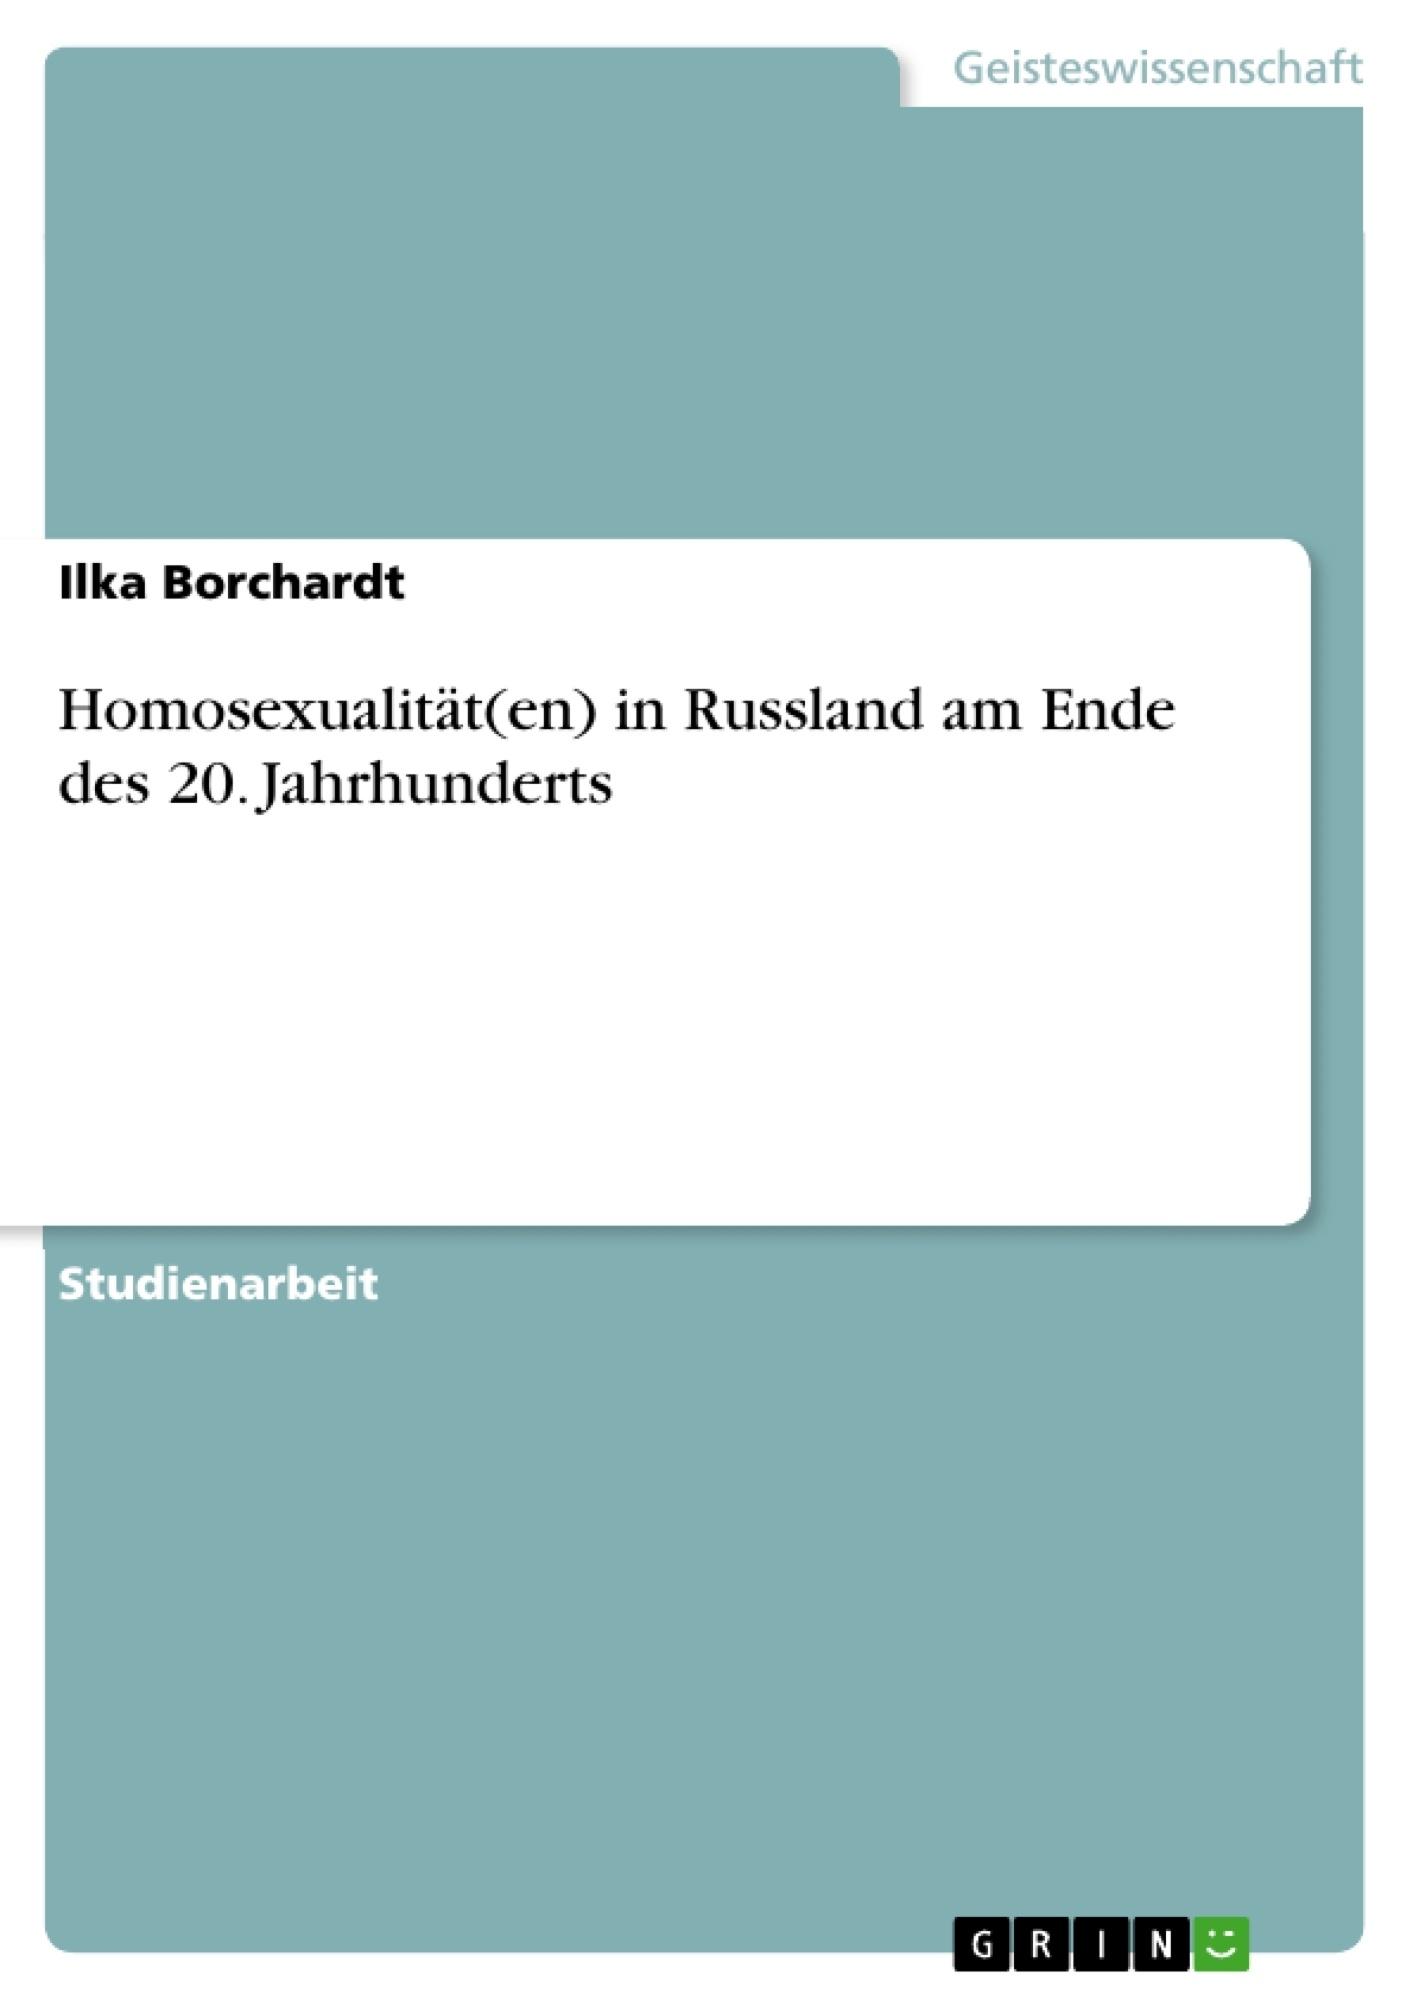 Titel:  Homosexualität(en)  in Russland am Ende des 20. Jahrhunderts